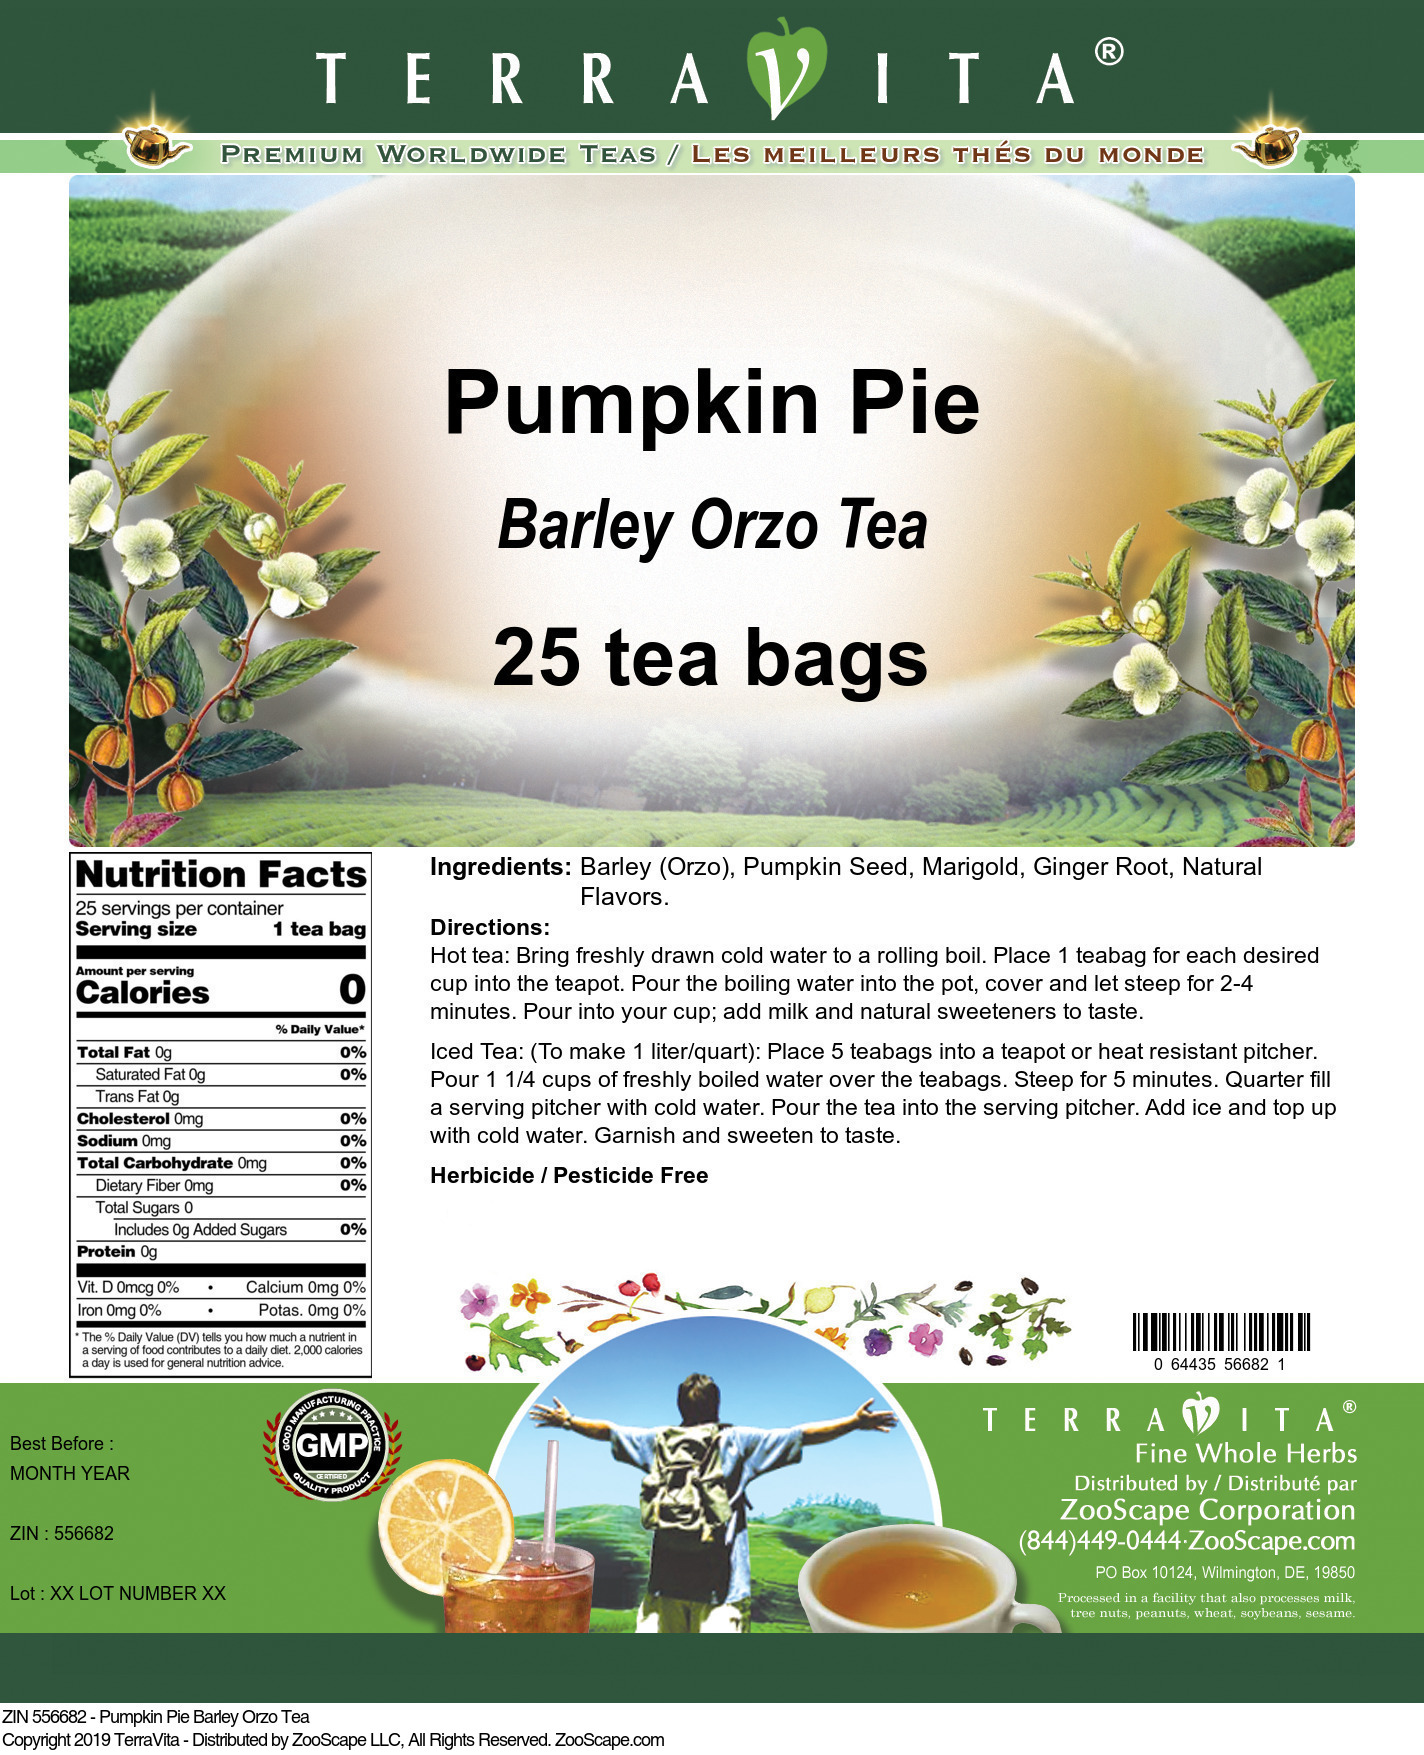 Pumpkin Pie Barley Orzo